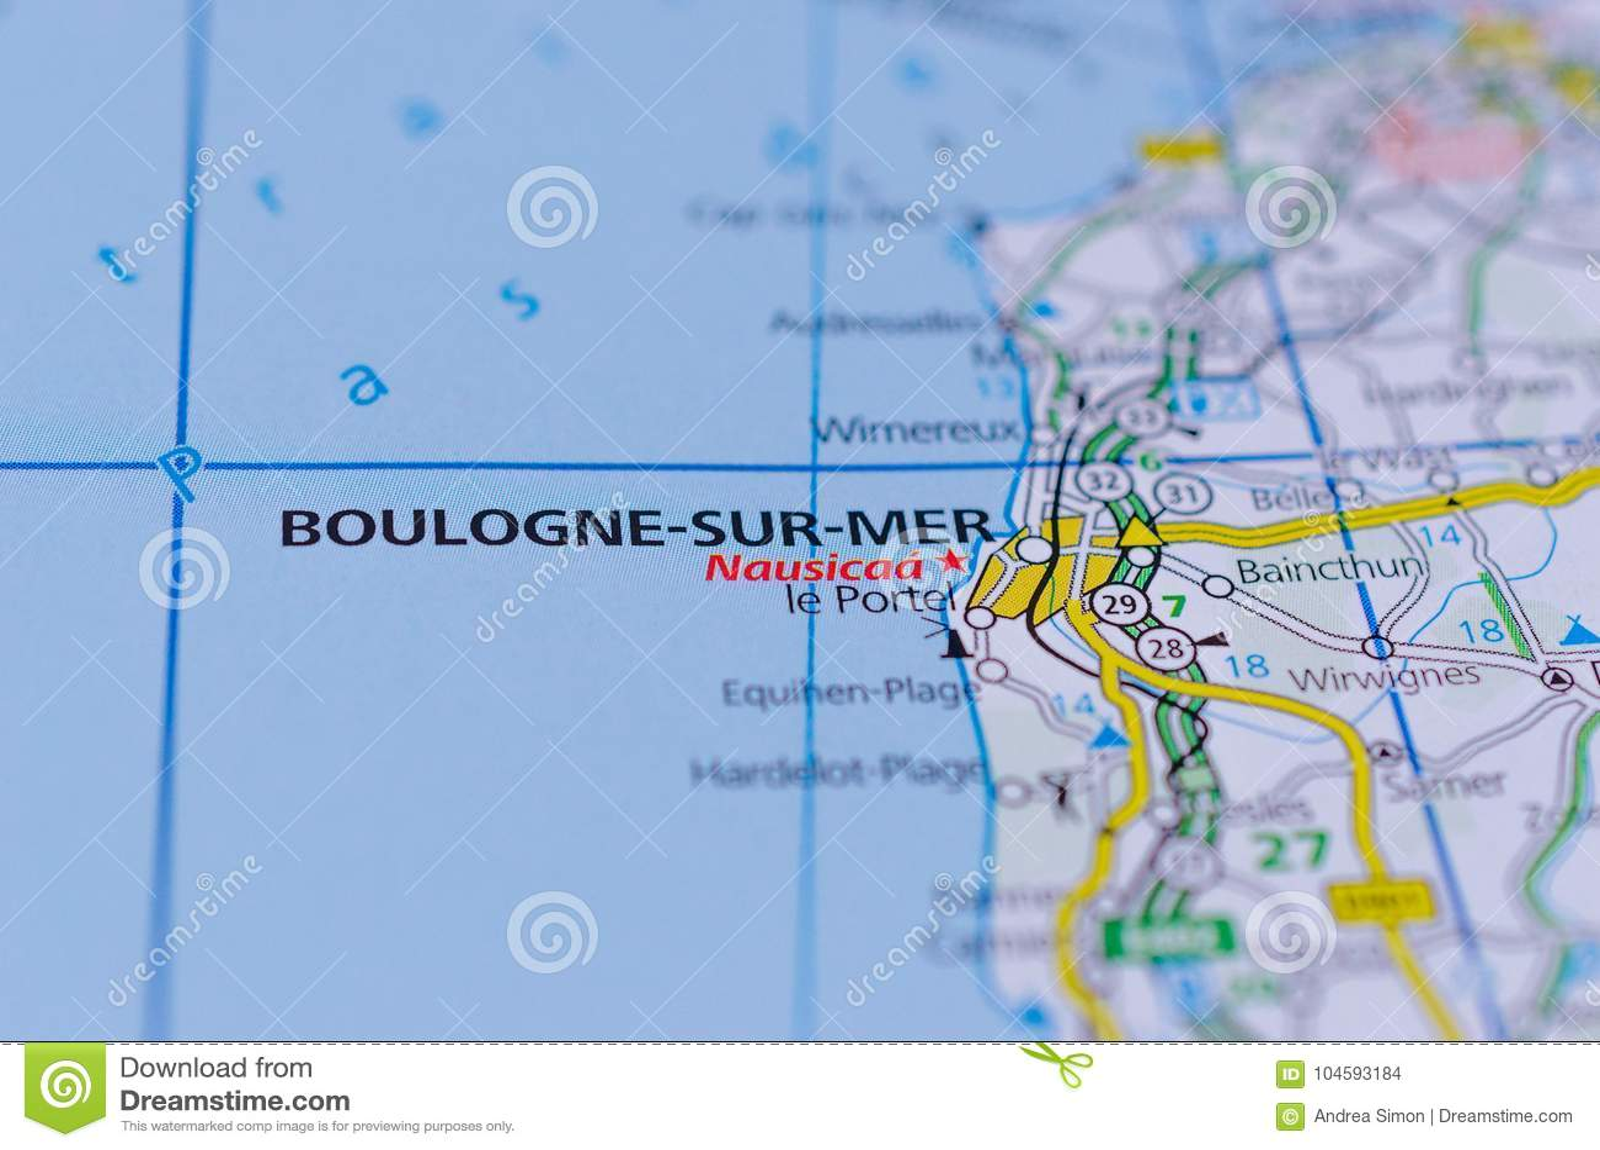 Boulogne-sur-Mer on map